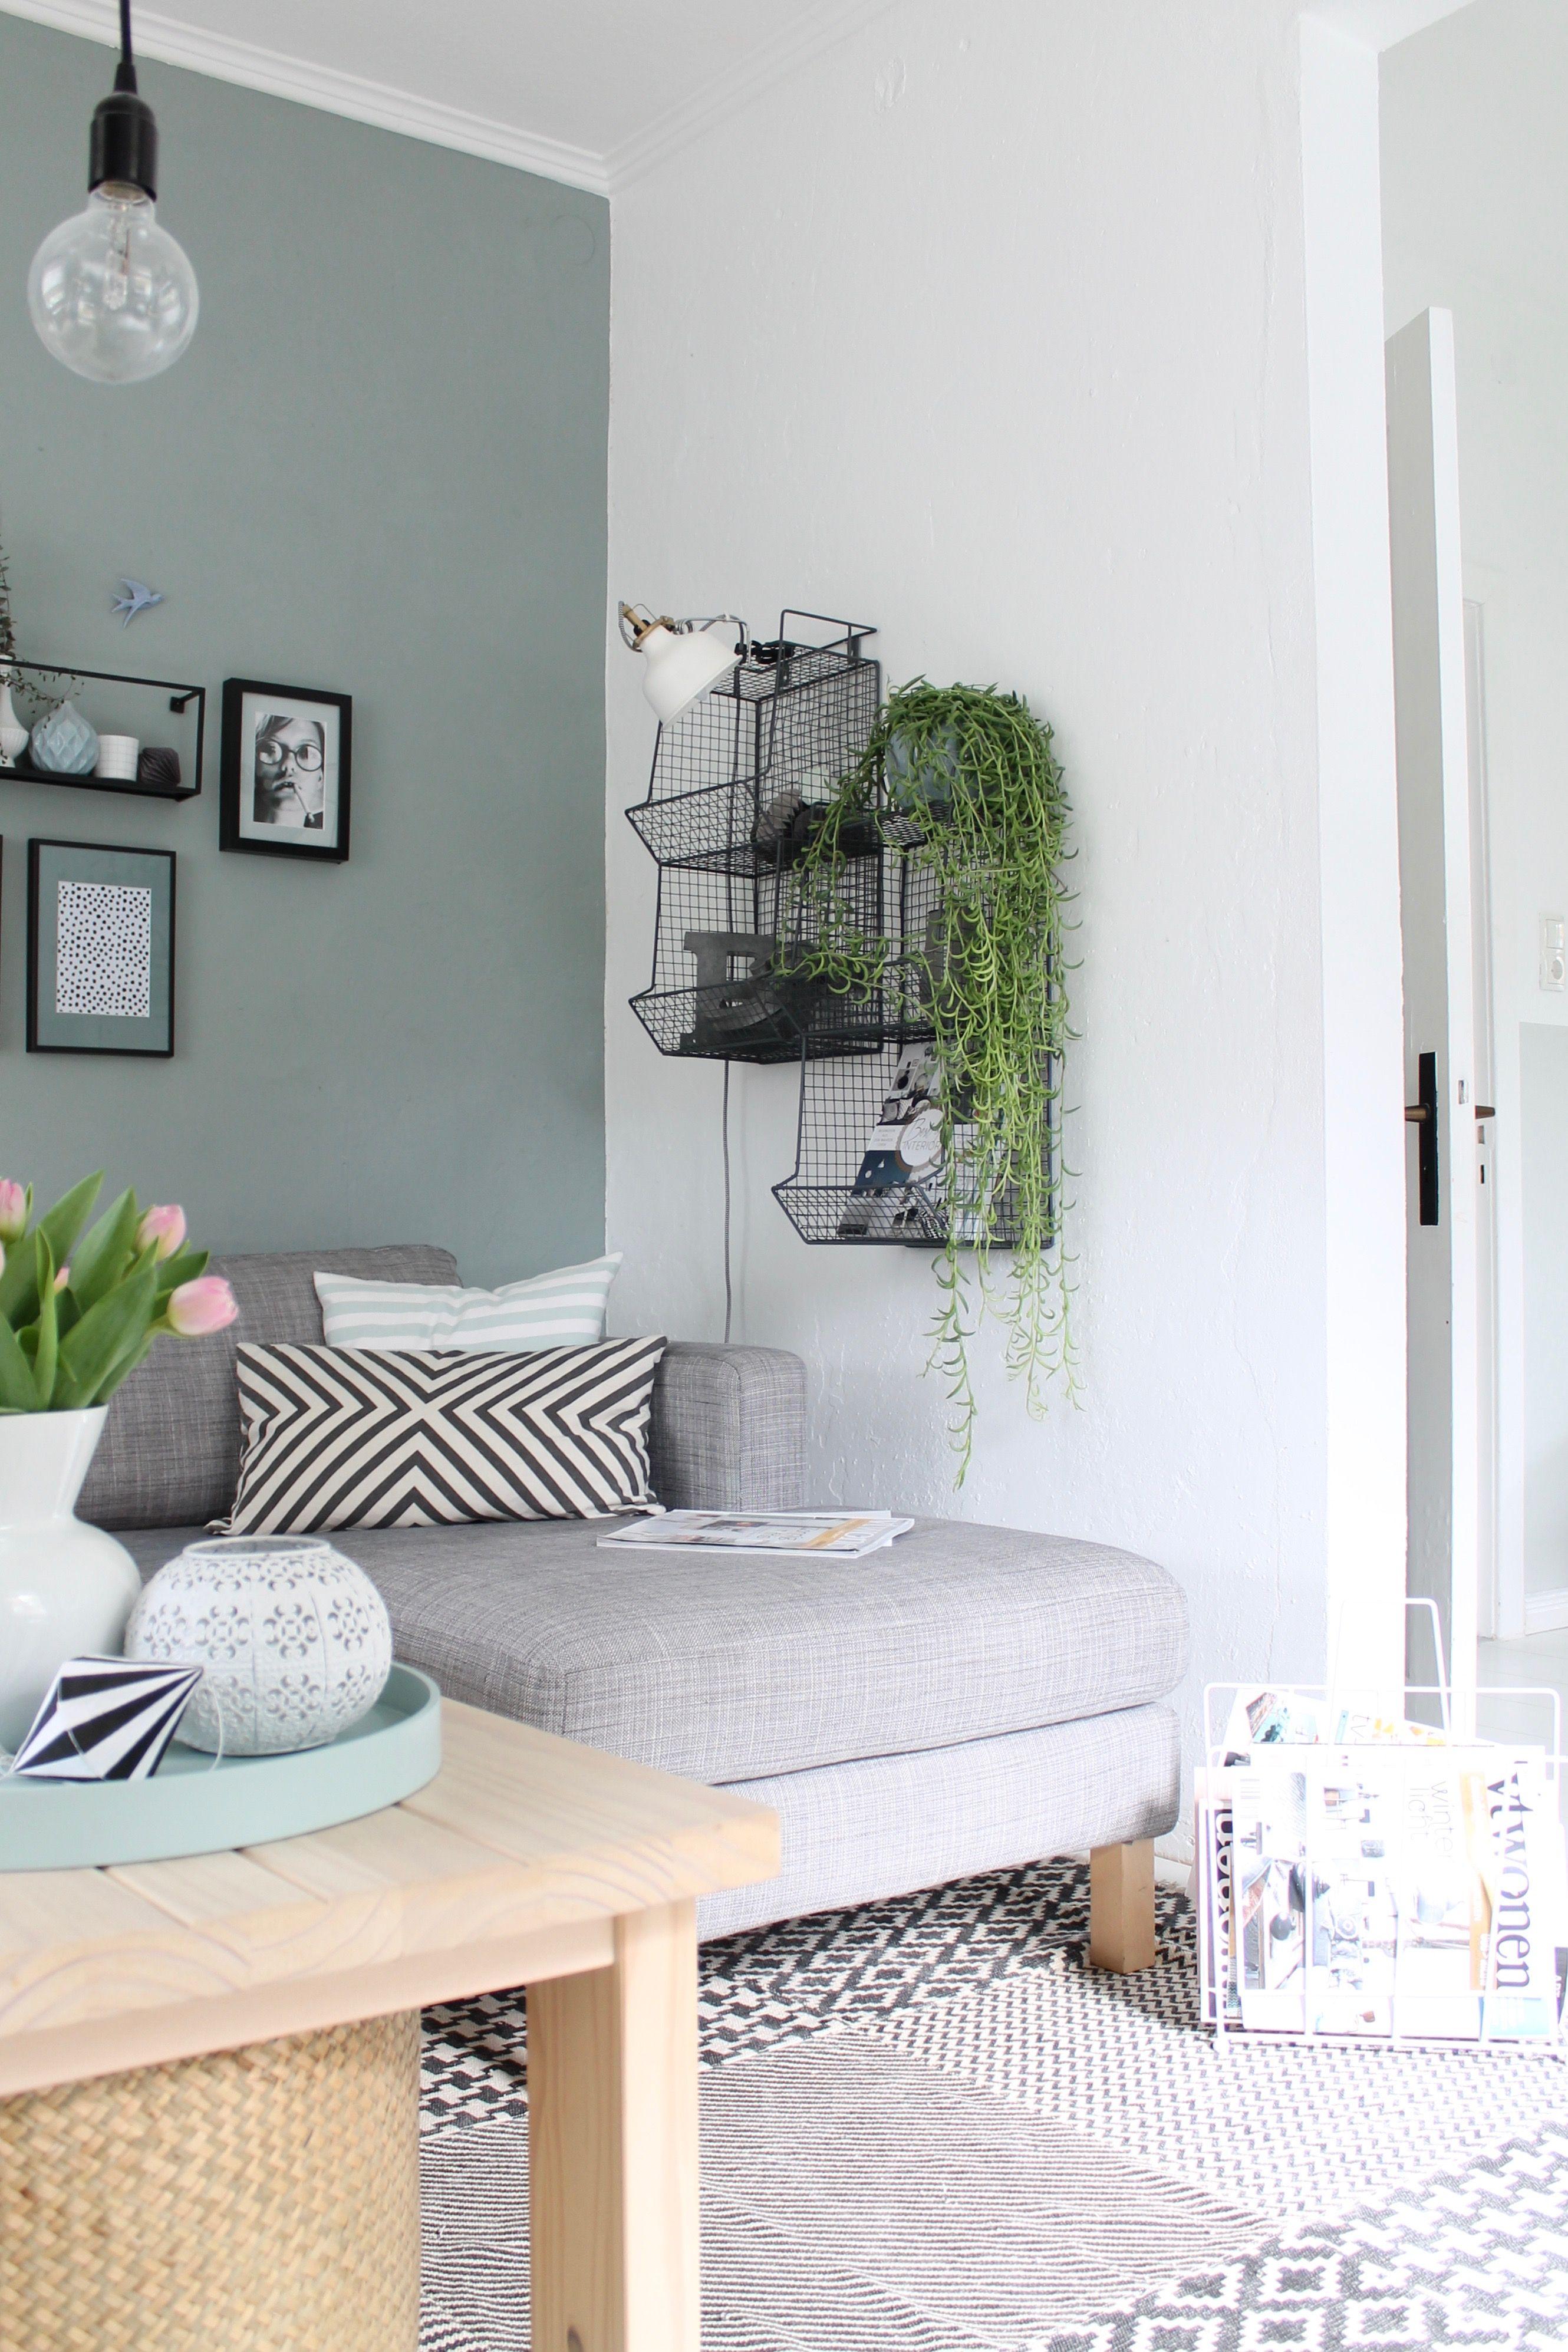 grün an der Wand | Farbgestaltung wohnzimmer, Wandfarbe ...